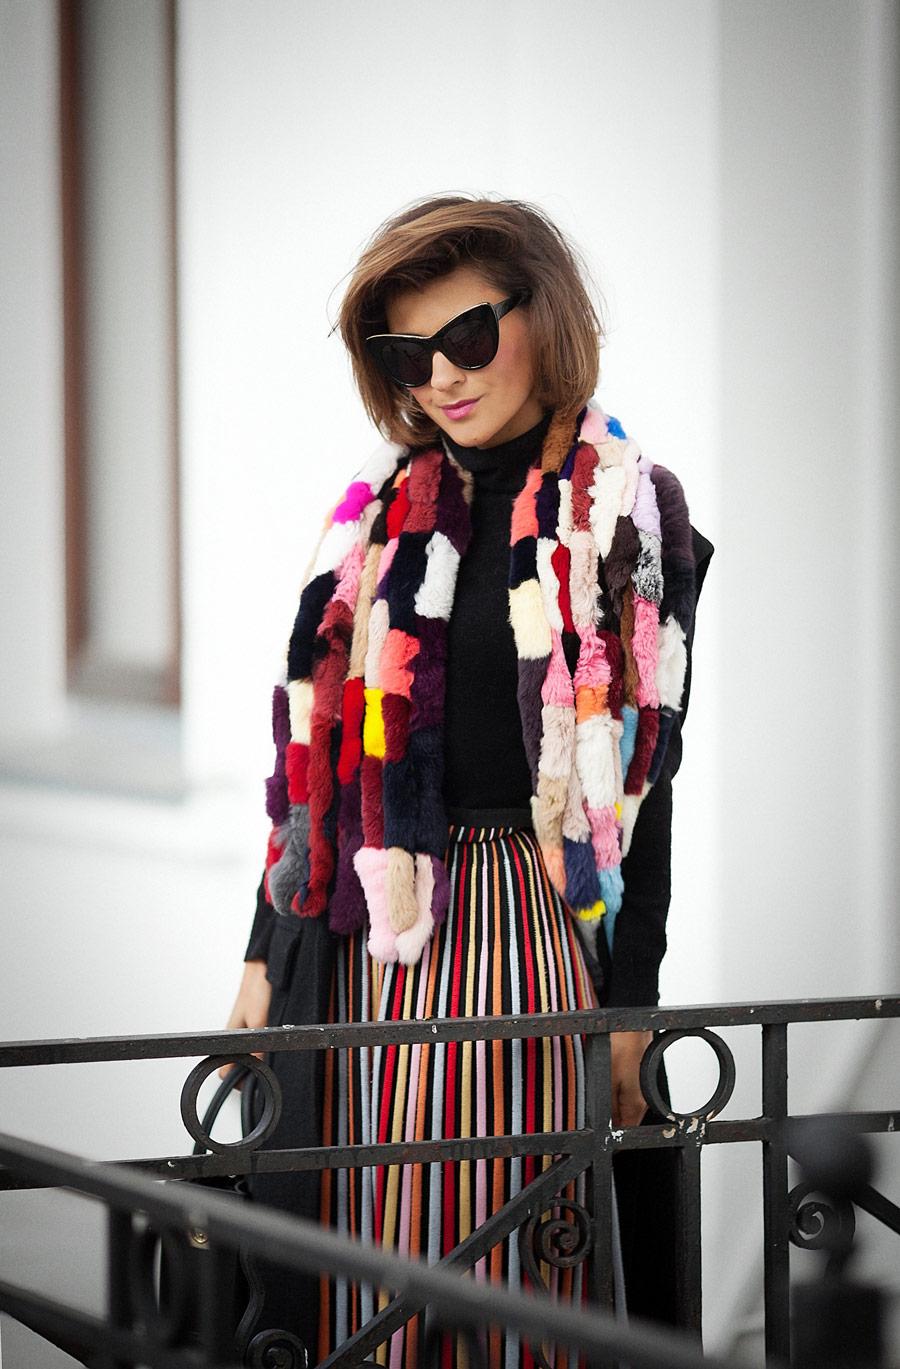 missoni skirt, fur scarf, fall outfit ideas, Ellena Galant, Елена Галант, осенние луки, осення мода, что носить осенью, вязаная юбка,